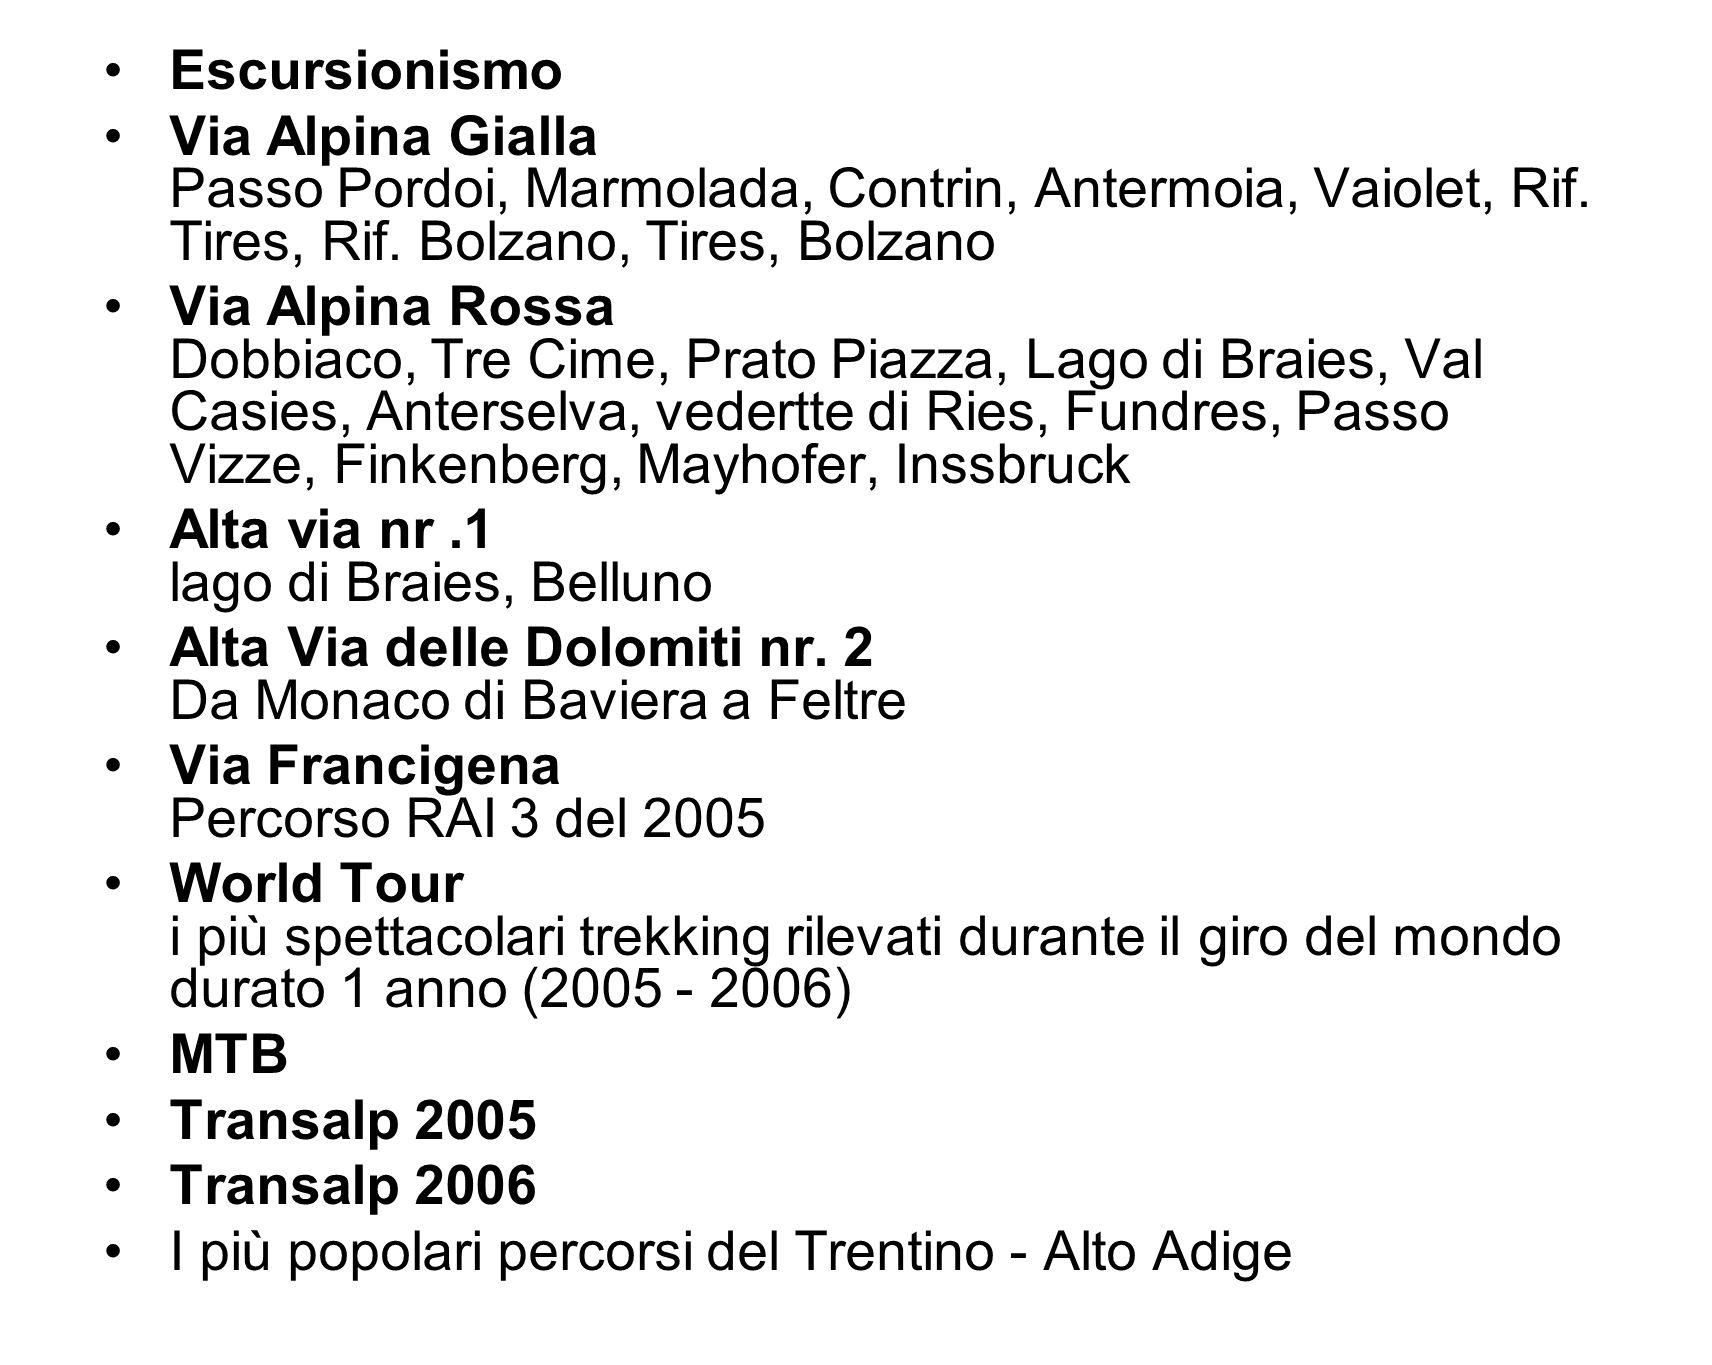 Escursionismo Via Alpina Gialla Passo Pordoi, Marmolada, Contrin, Antermoia, Vaiolet, Rif. Tires, Rif. Bolzano, Tires, Bolzano Via Alpina Rossa Dobbia